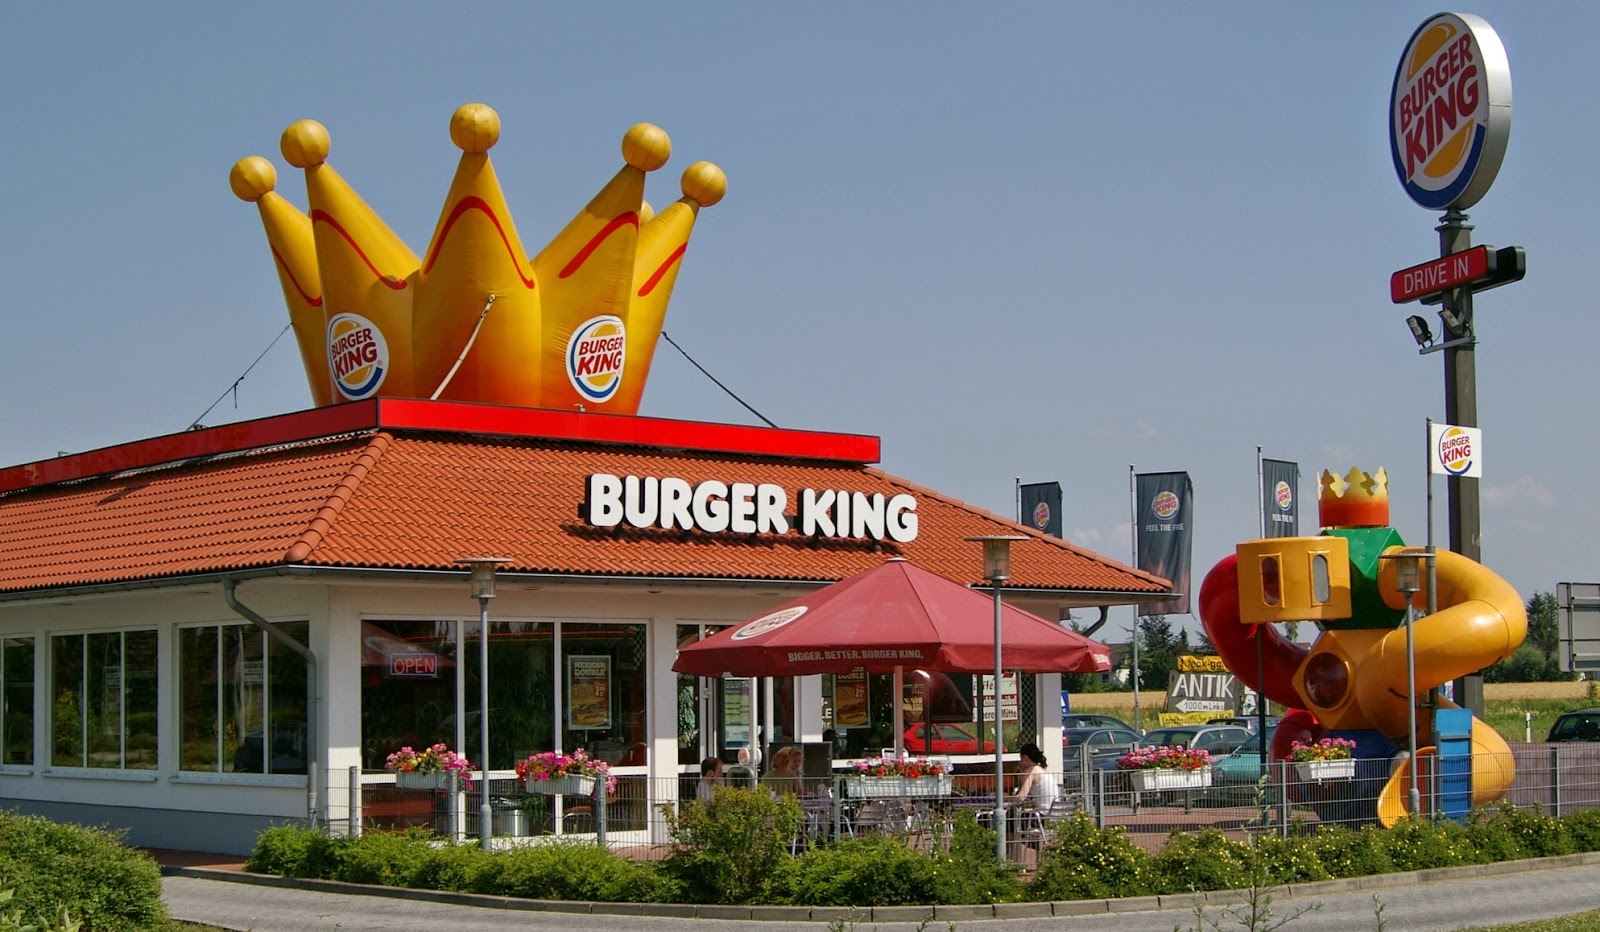 Lanchonete fast food Burger King Miami Orlando